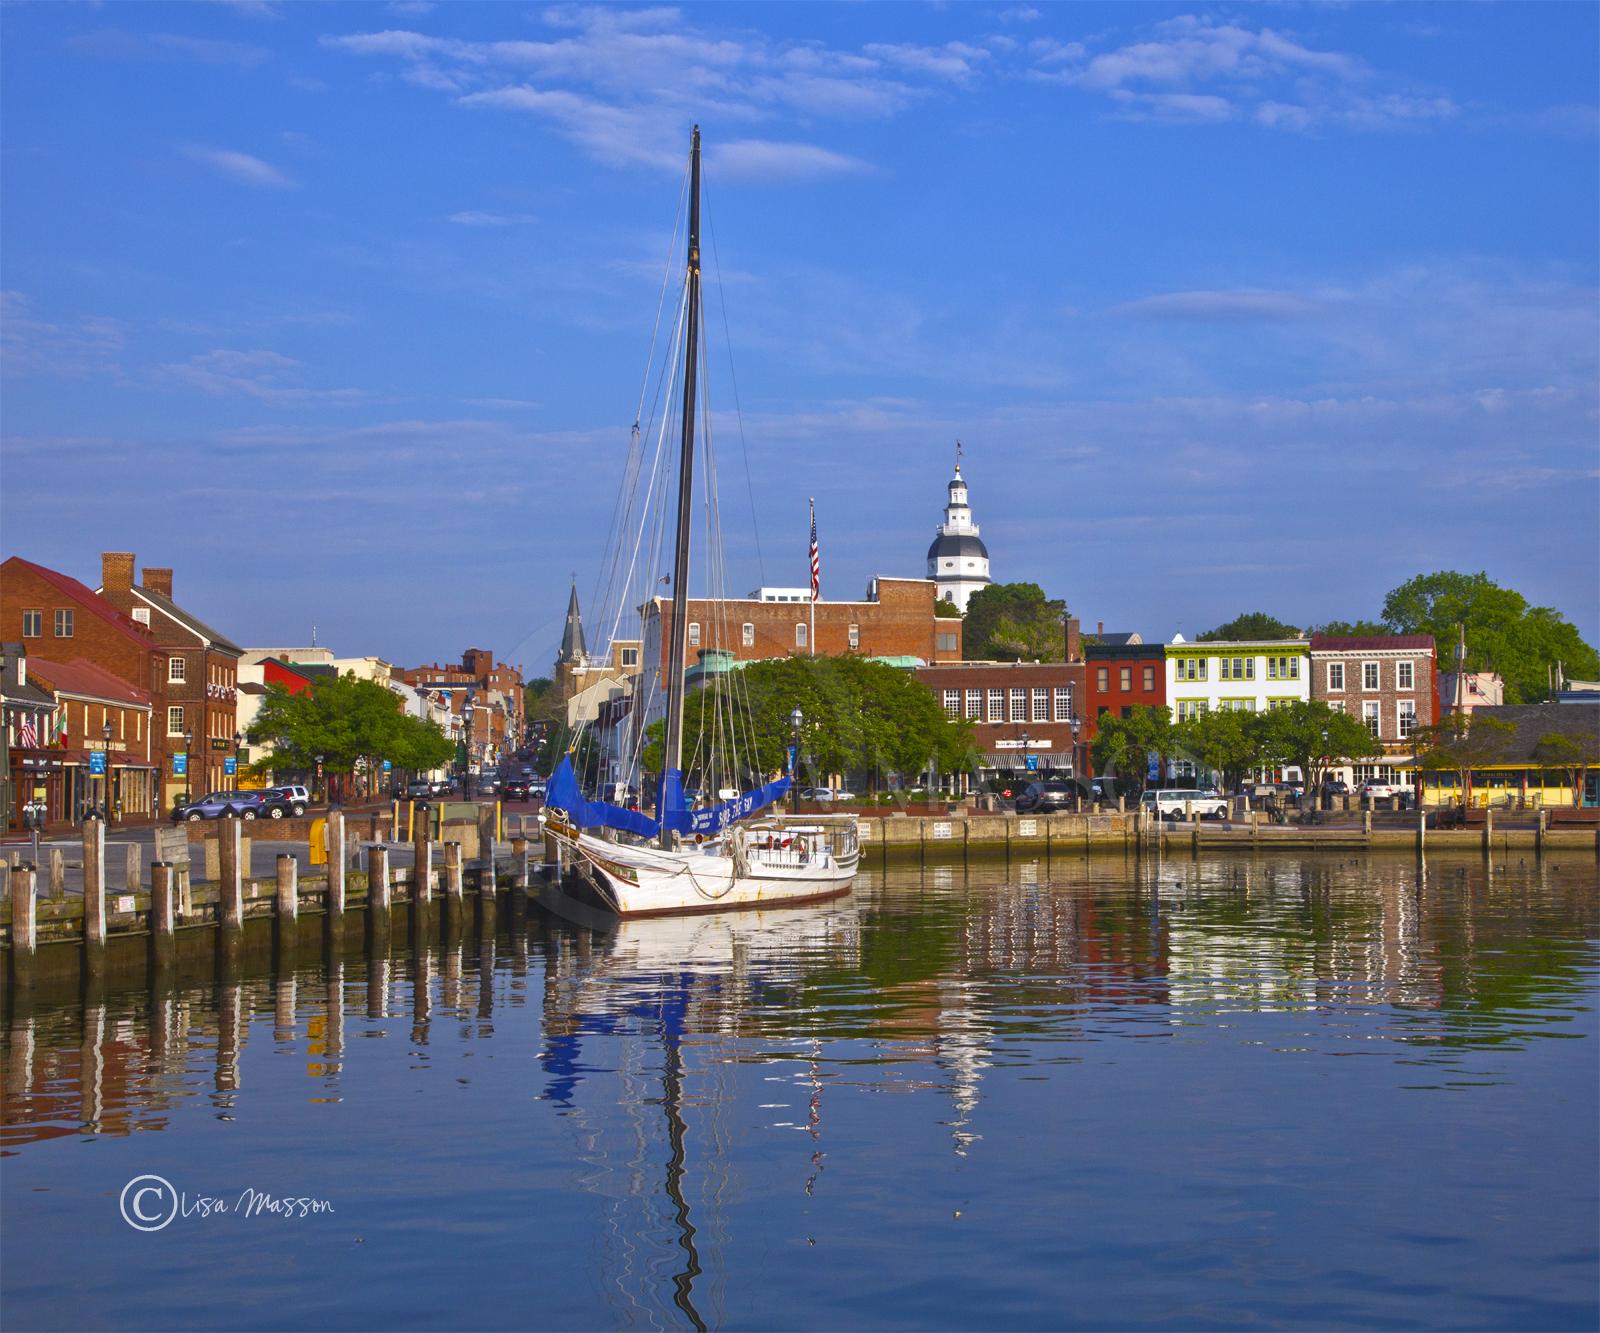 City Dock 8270.jpg